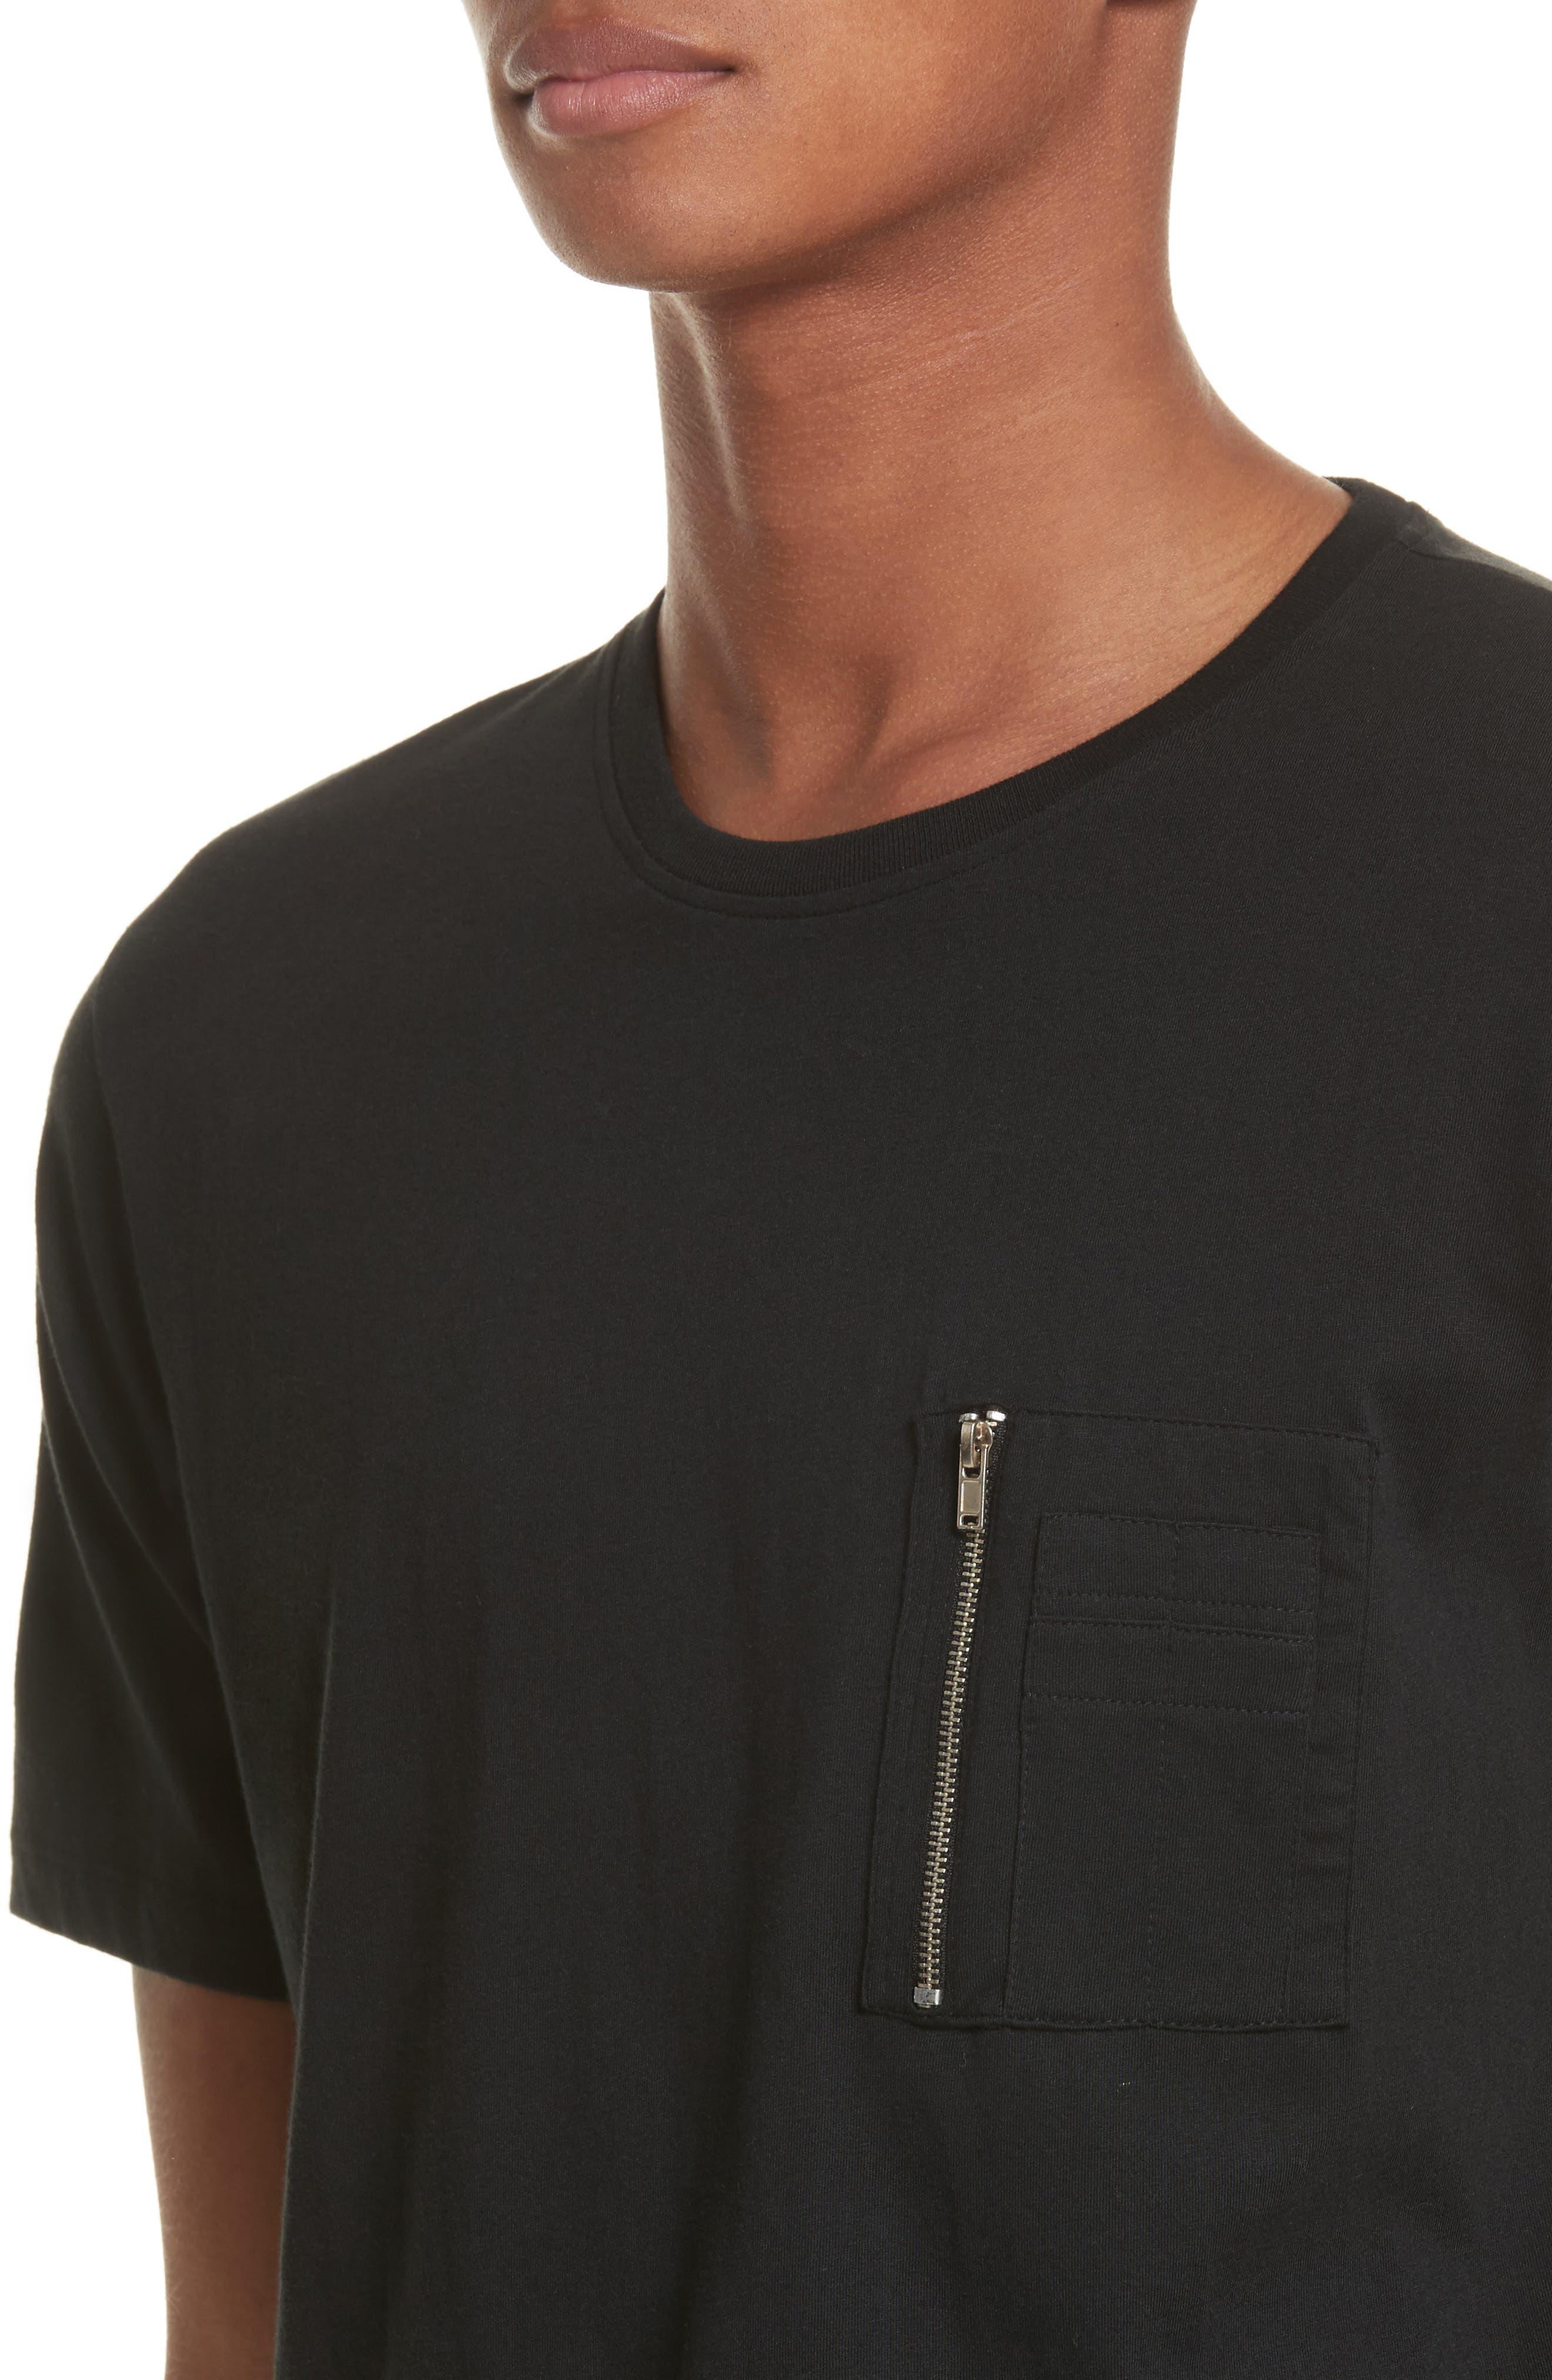 Alternate Image 4  - The Kooples Zip Pocket T-Shirt